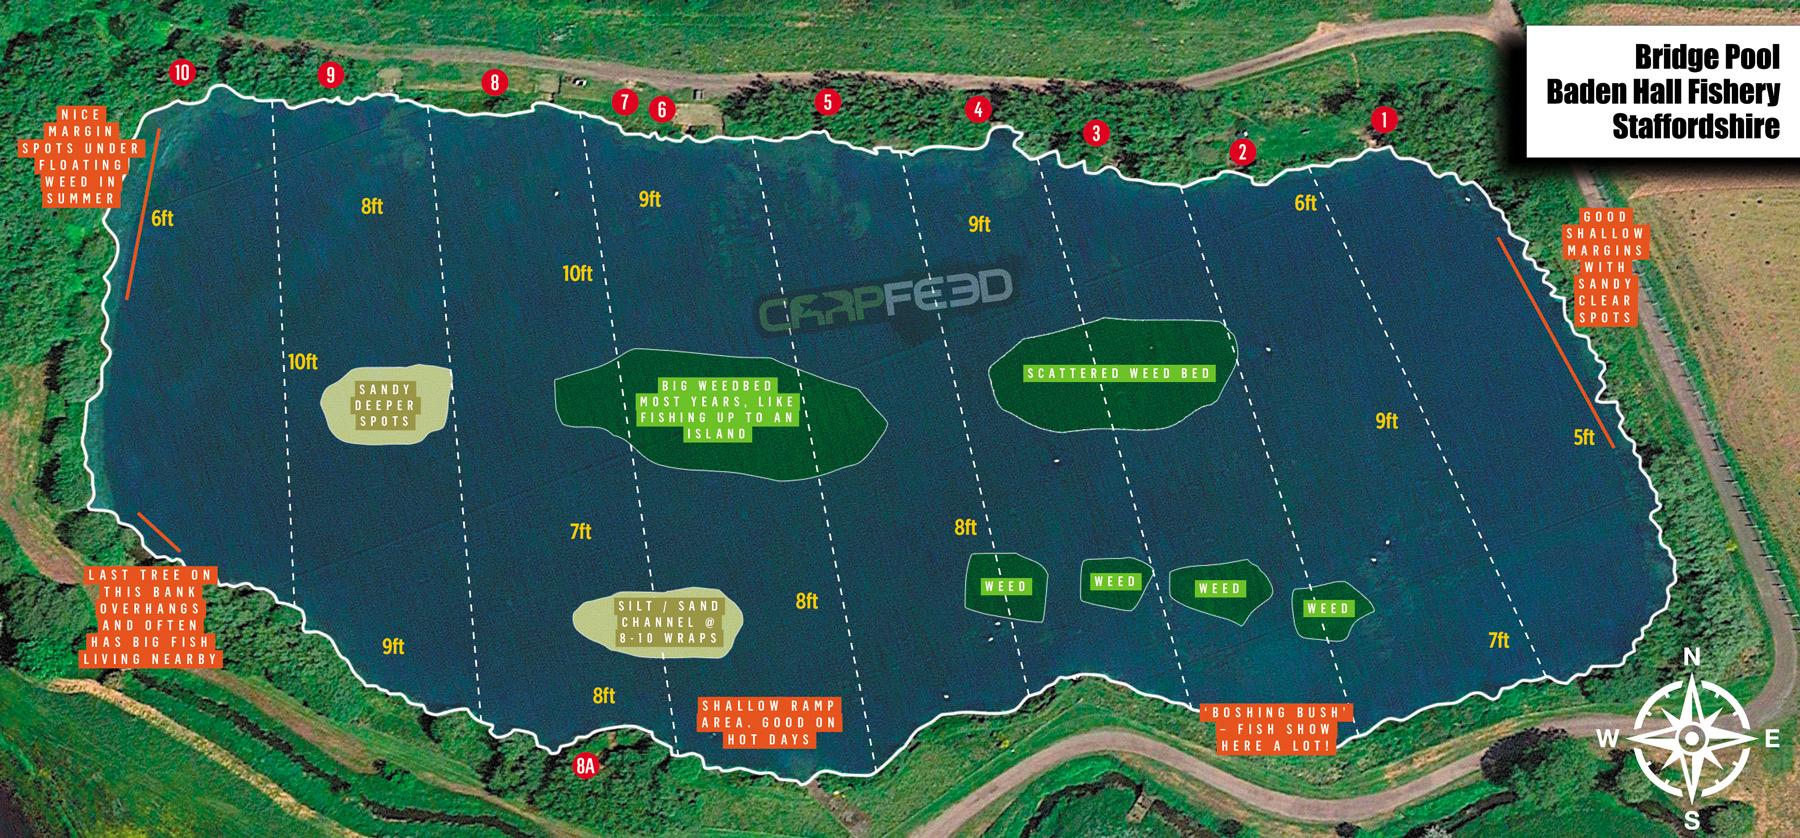 Baden Hall Bridge Pool map